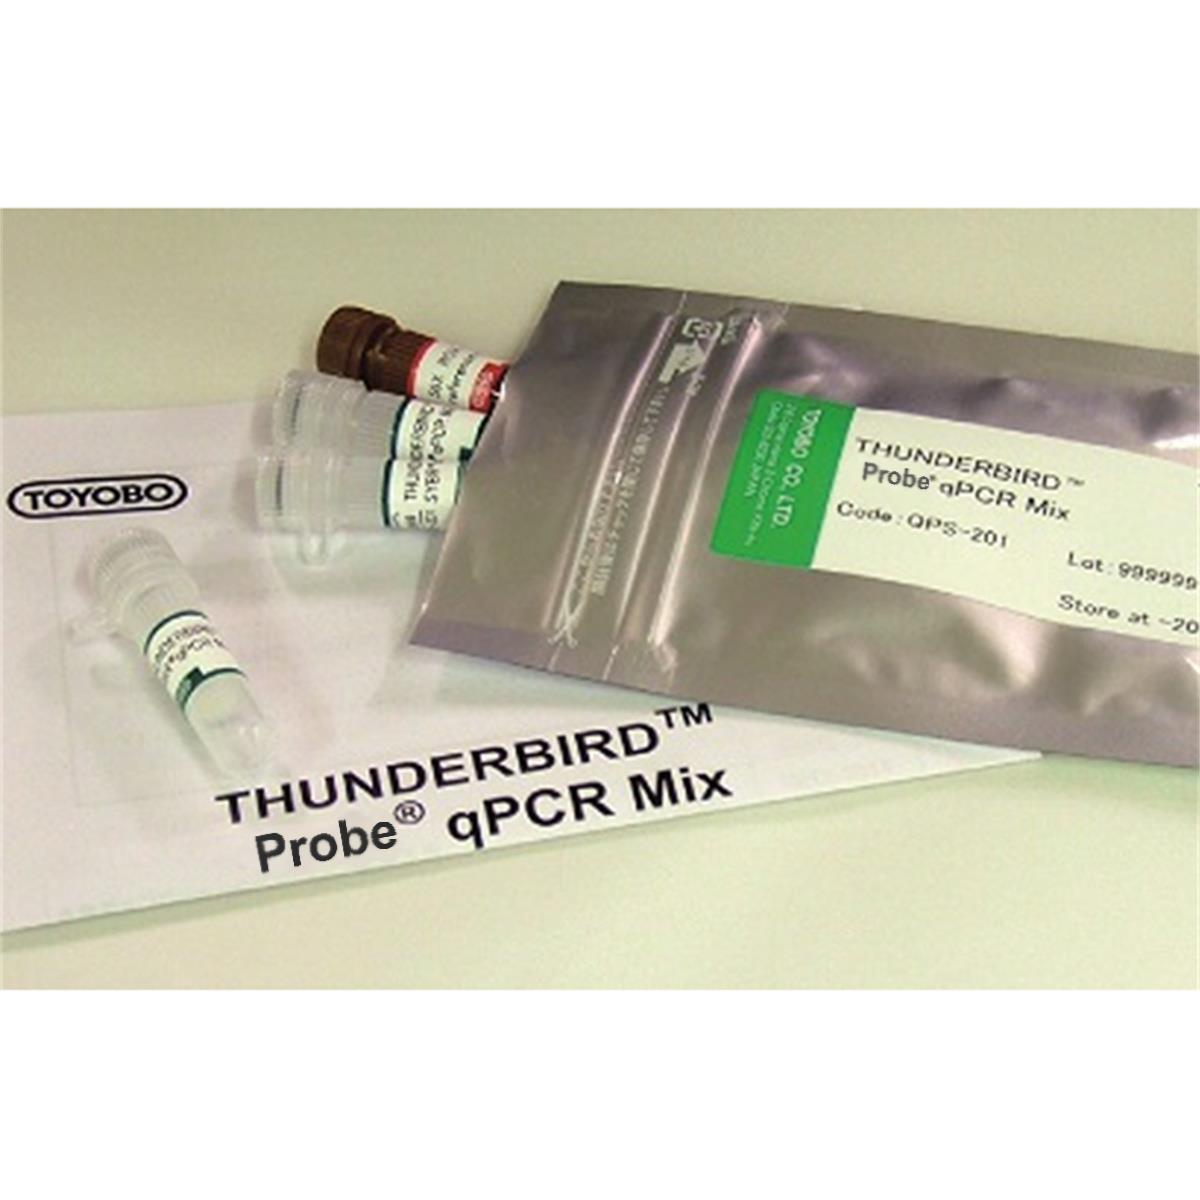 THUNDERBIRD Probe qPCR Master Mix